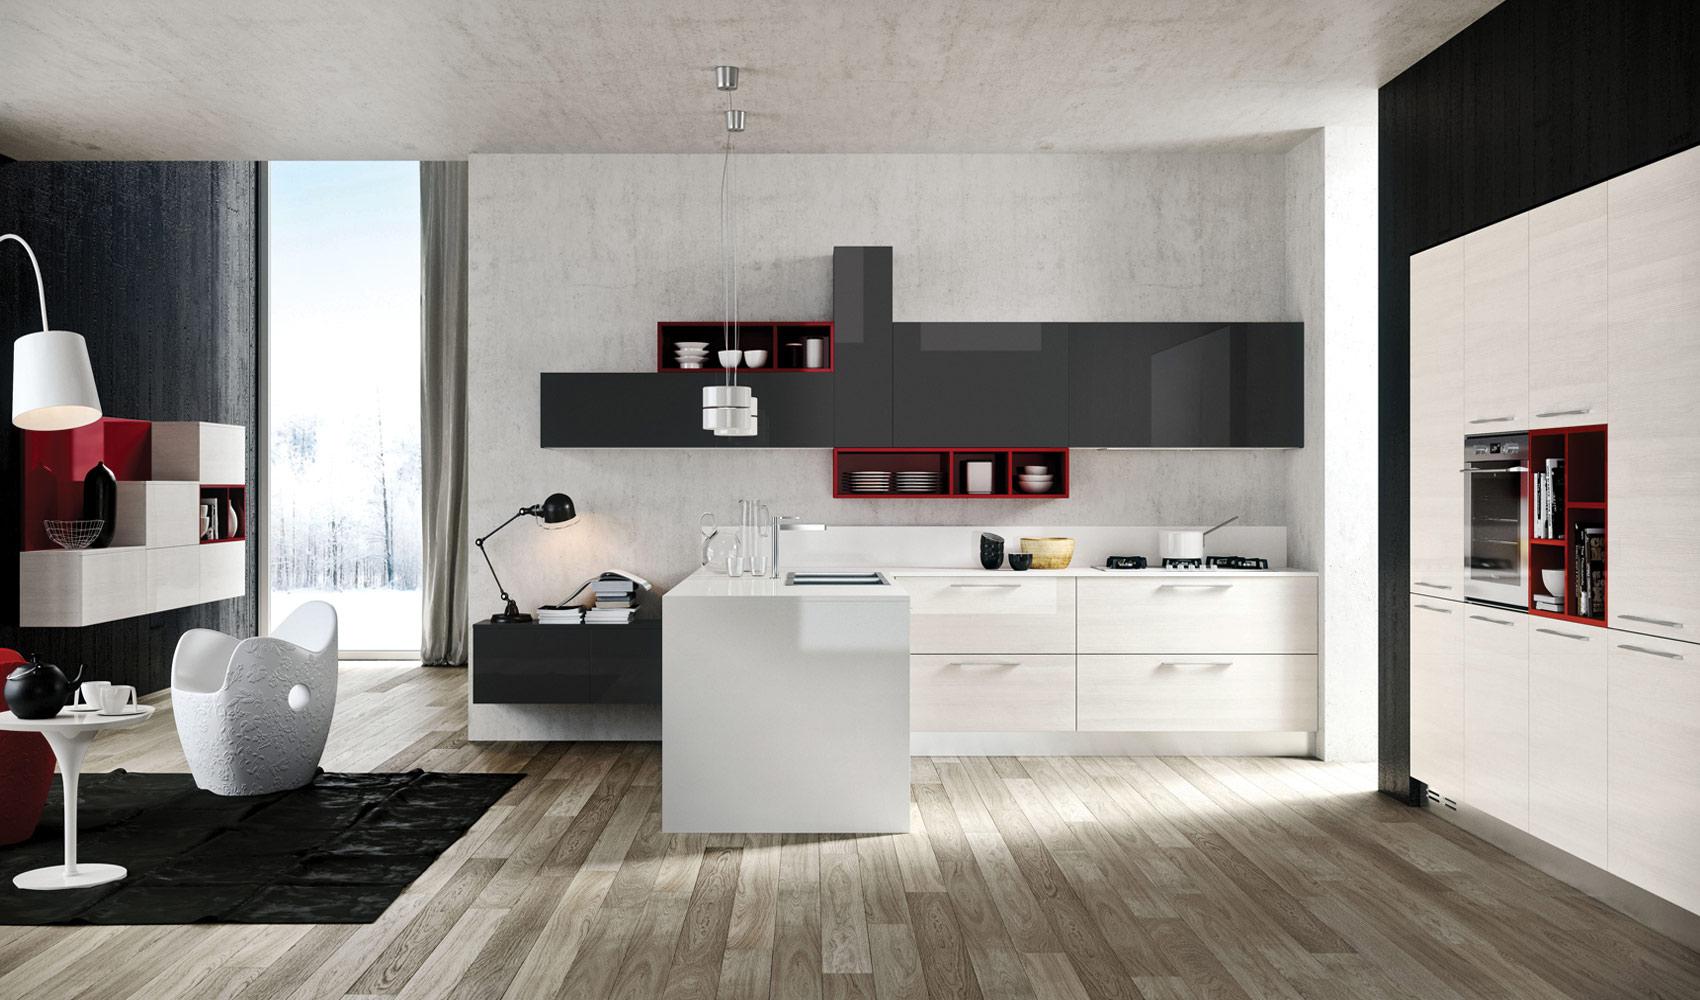 Dise o de cocinas modernas al estilo arte pop construye for Estilo de cocina moderna